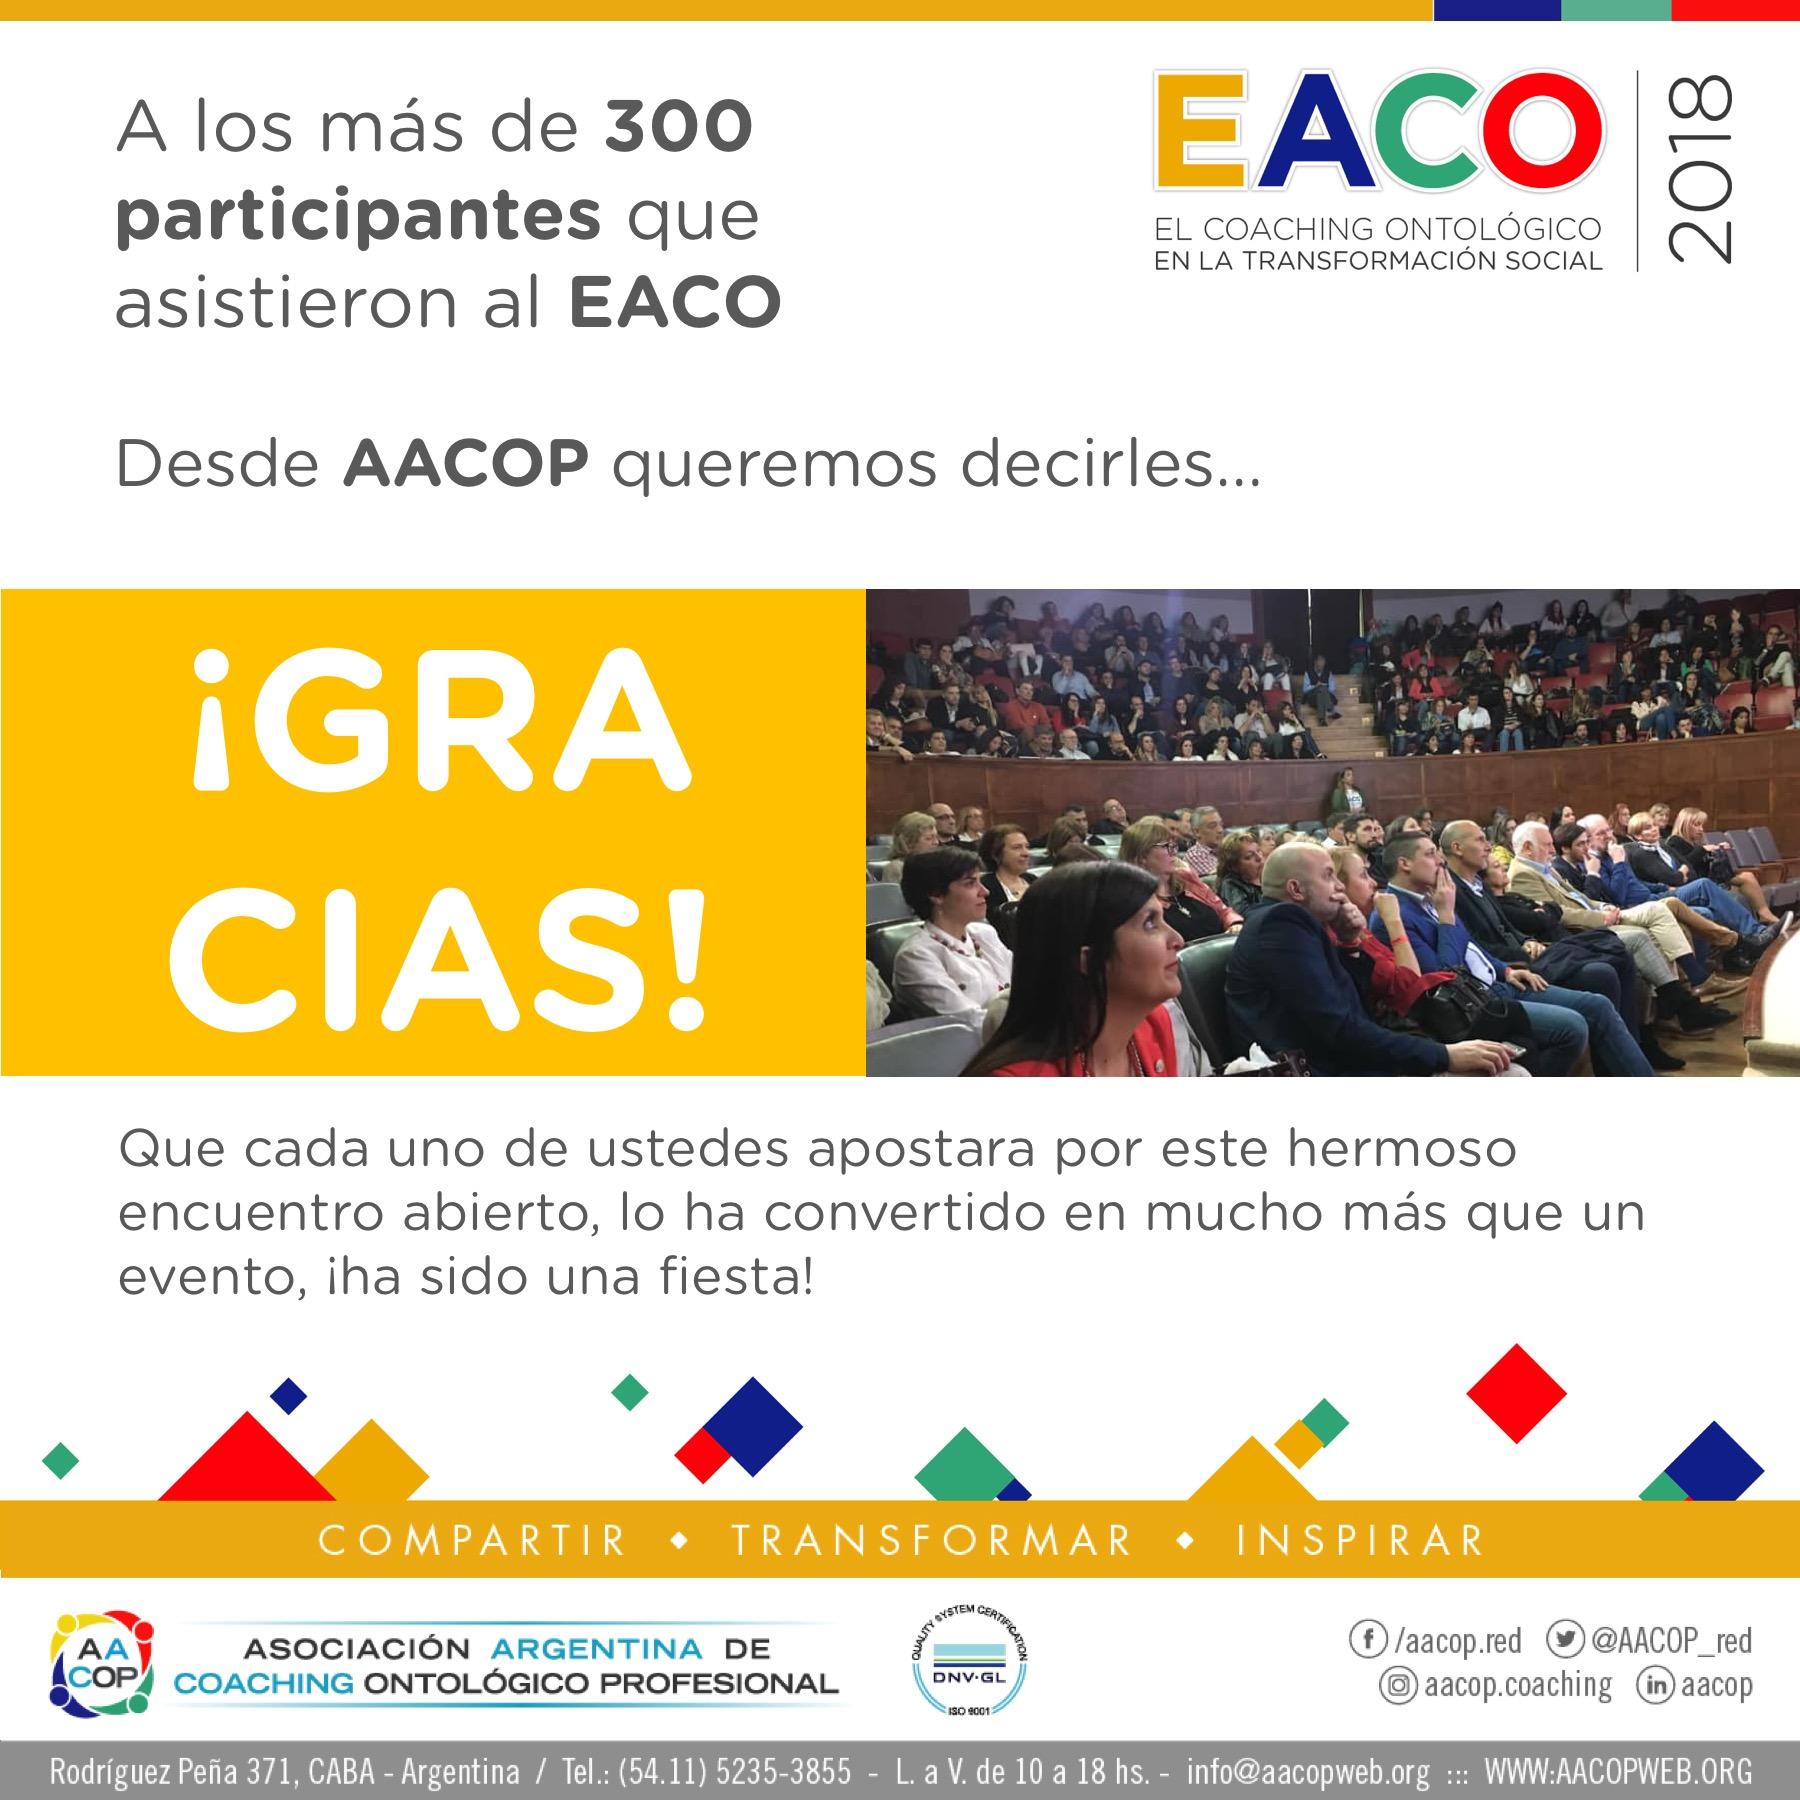 Muchas, muchas ¡¡Gracias!! por este maravilloso EACO 2018 | imagen 1